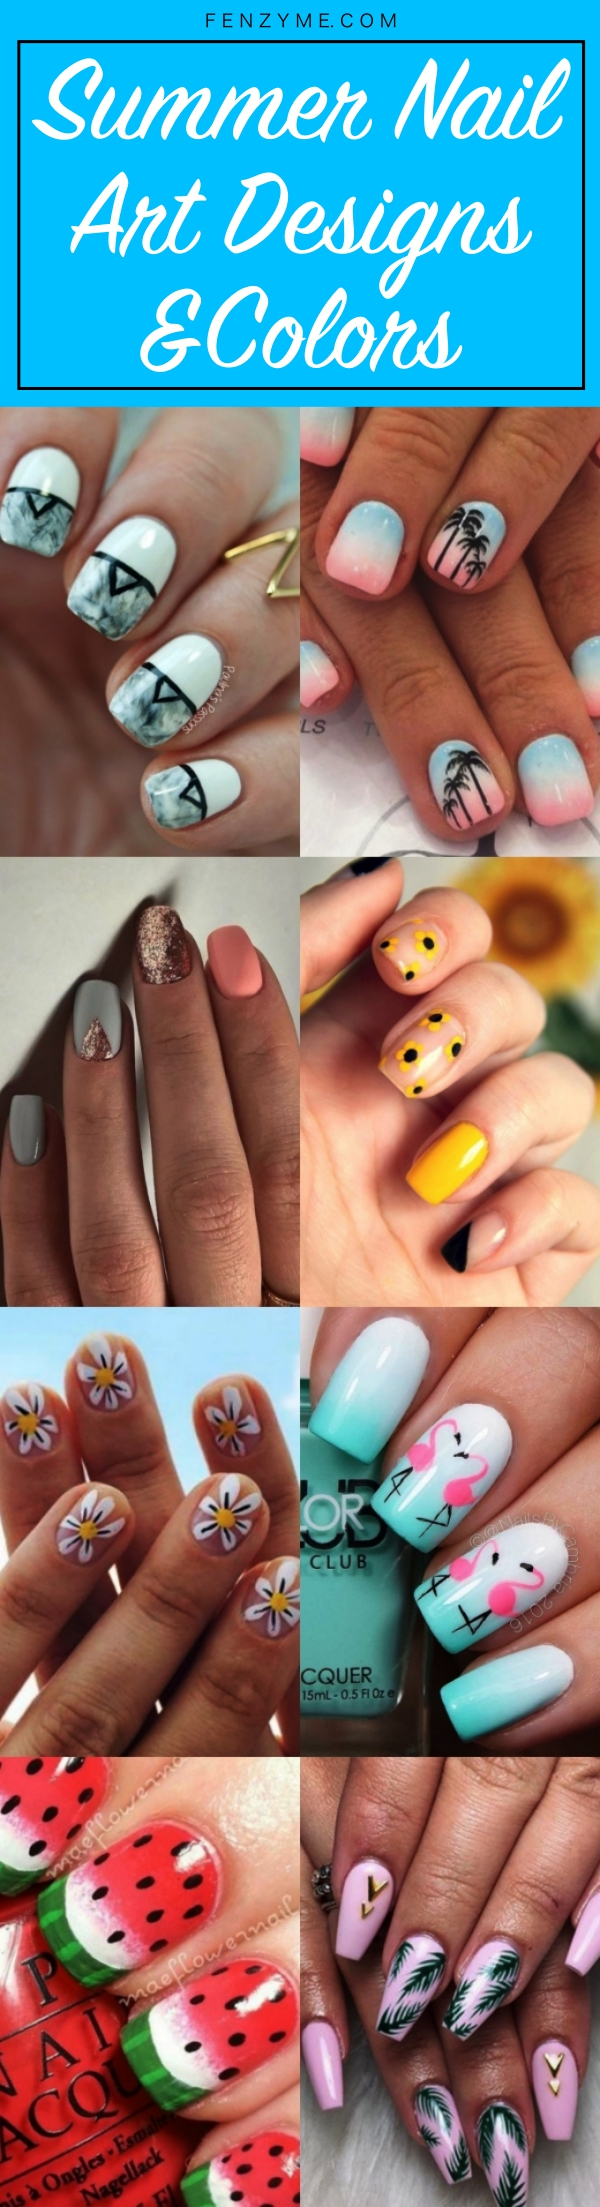 Summer Nail Art Designs and Colors